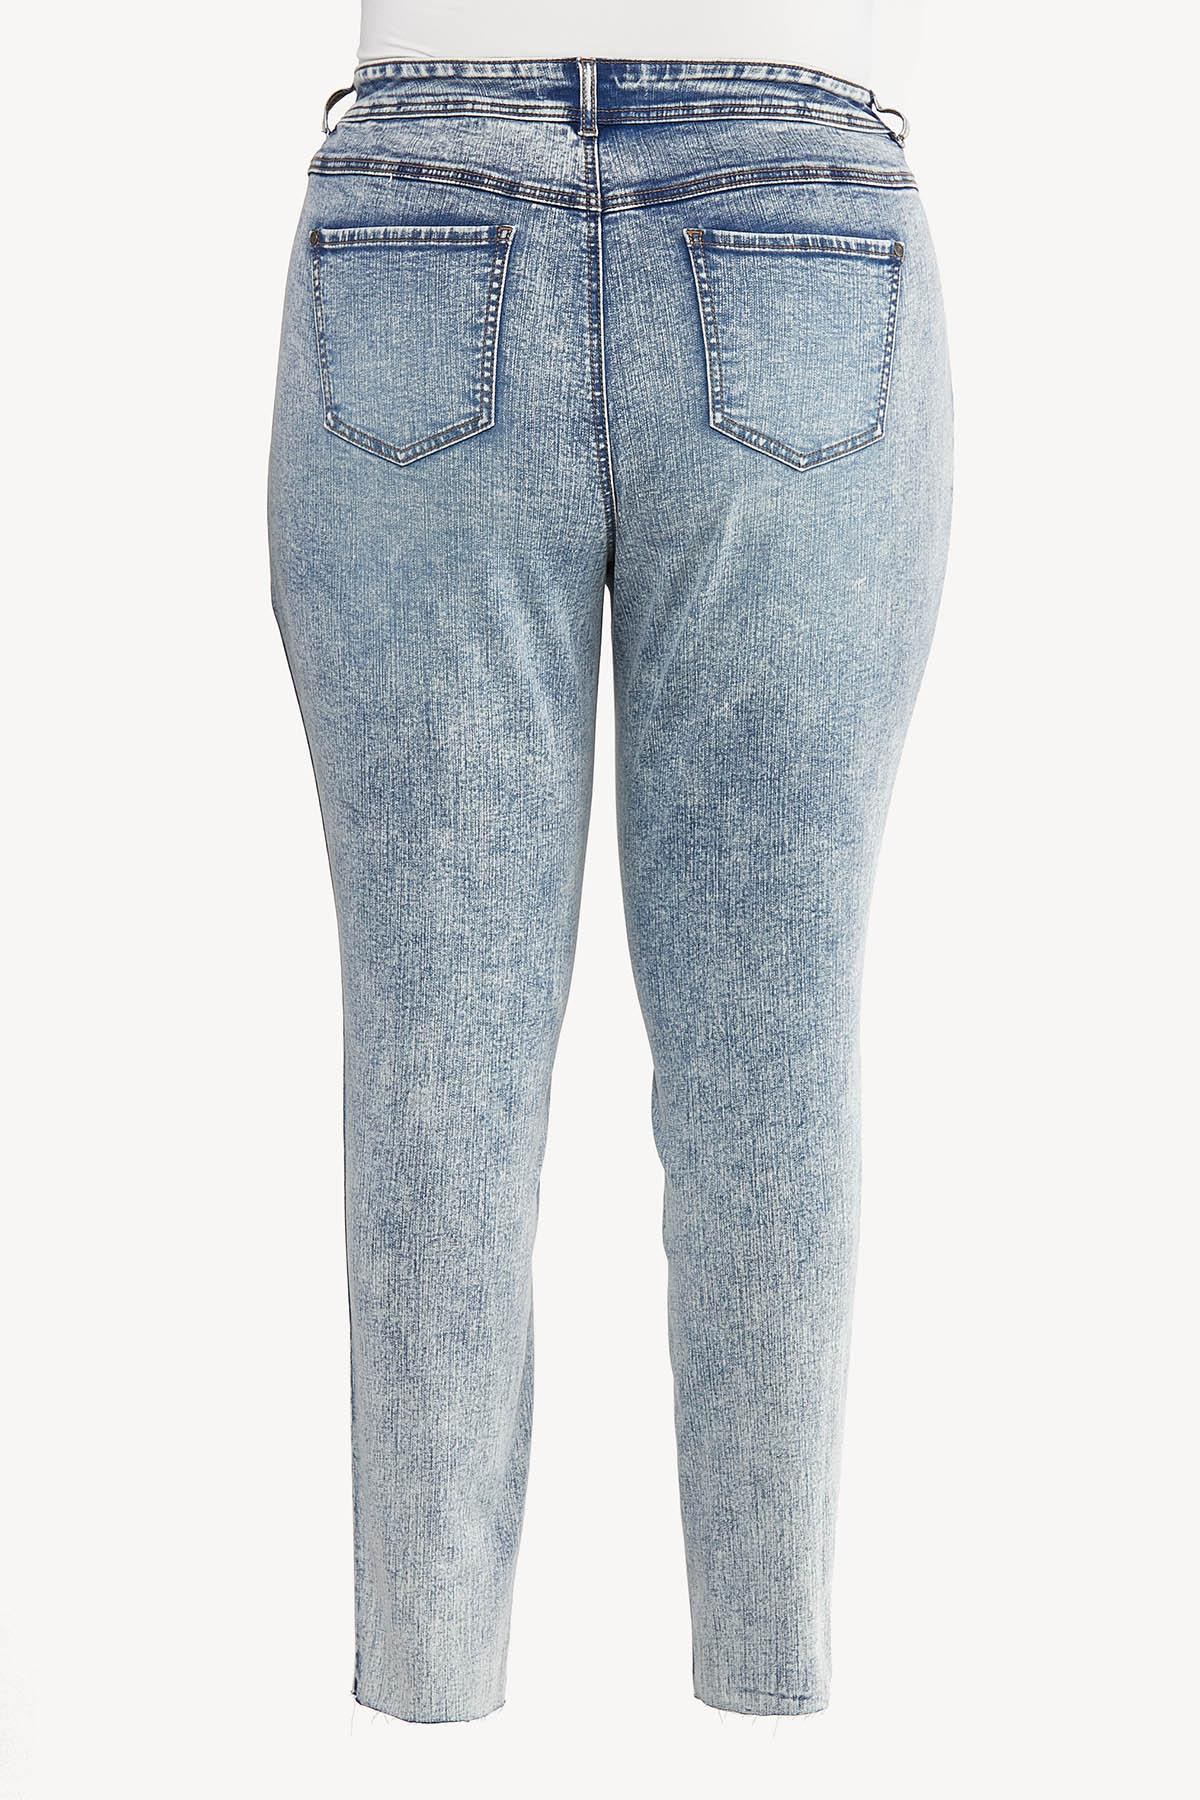 Plus Size Acid Wash Skinny Jeans (Item #44645841)